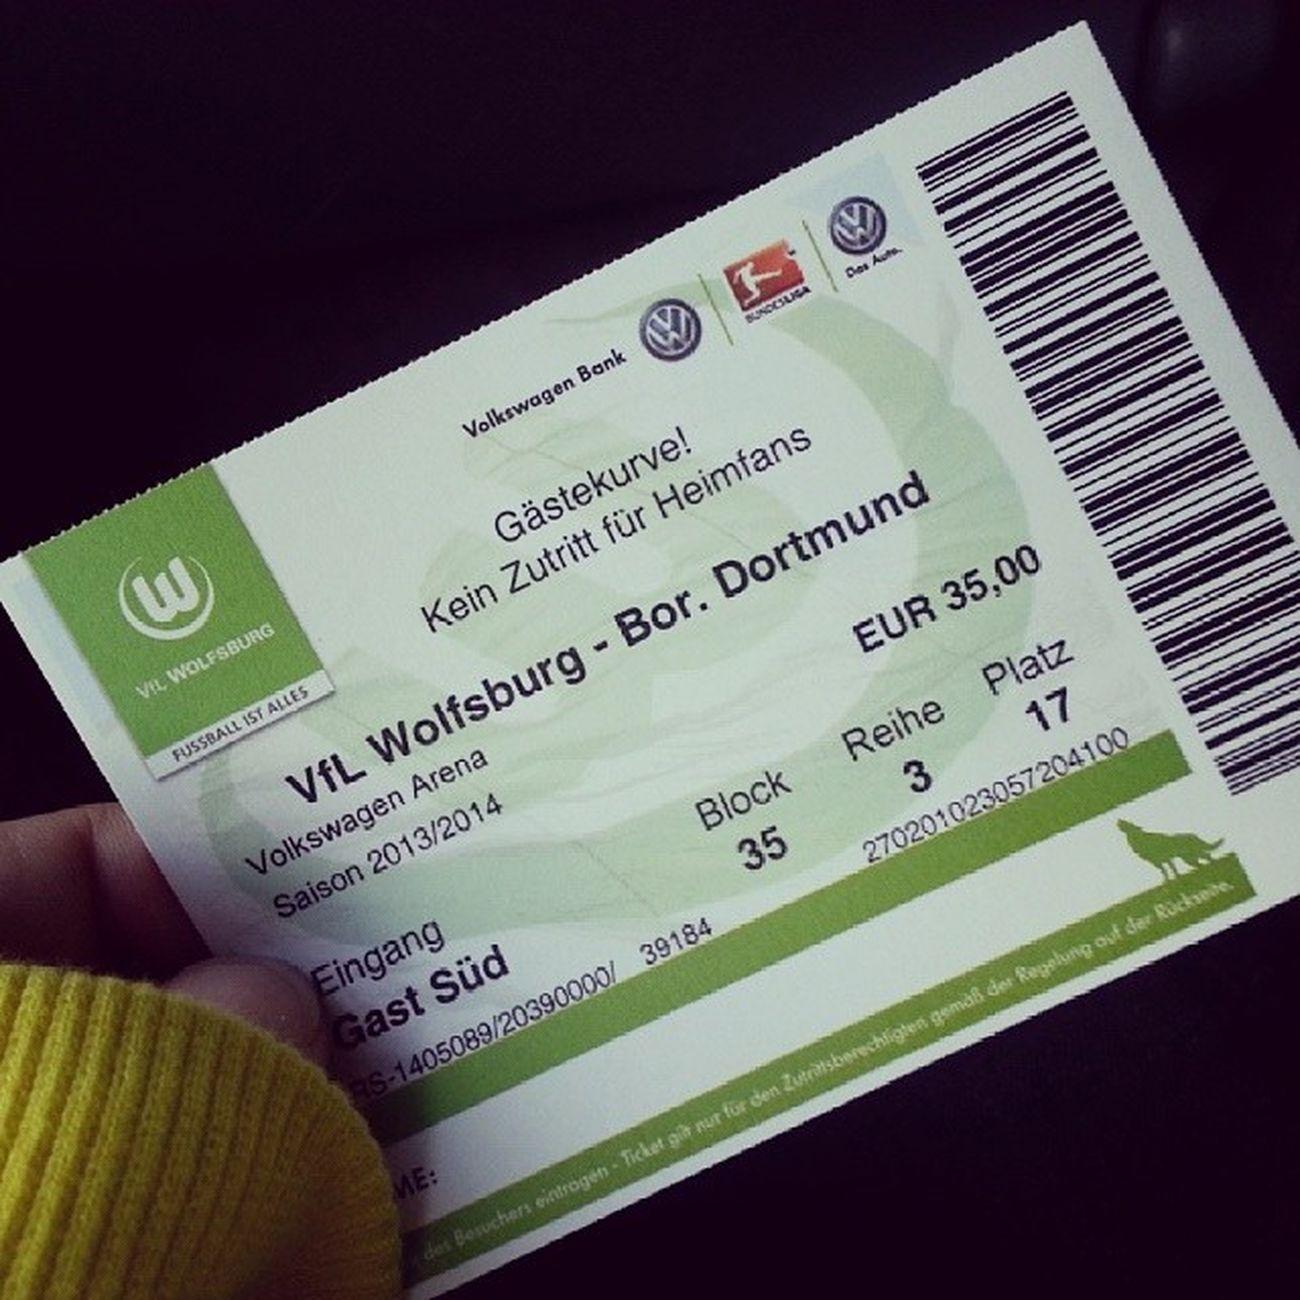 #BVB-Fanabteilung on tour #wobbvb #borussiadortmund BvB Borussiadortmund Wobbvb